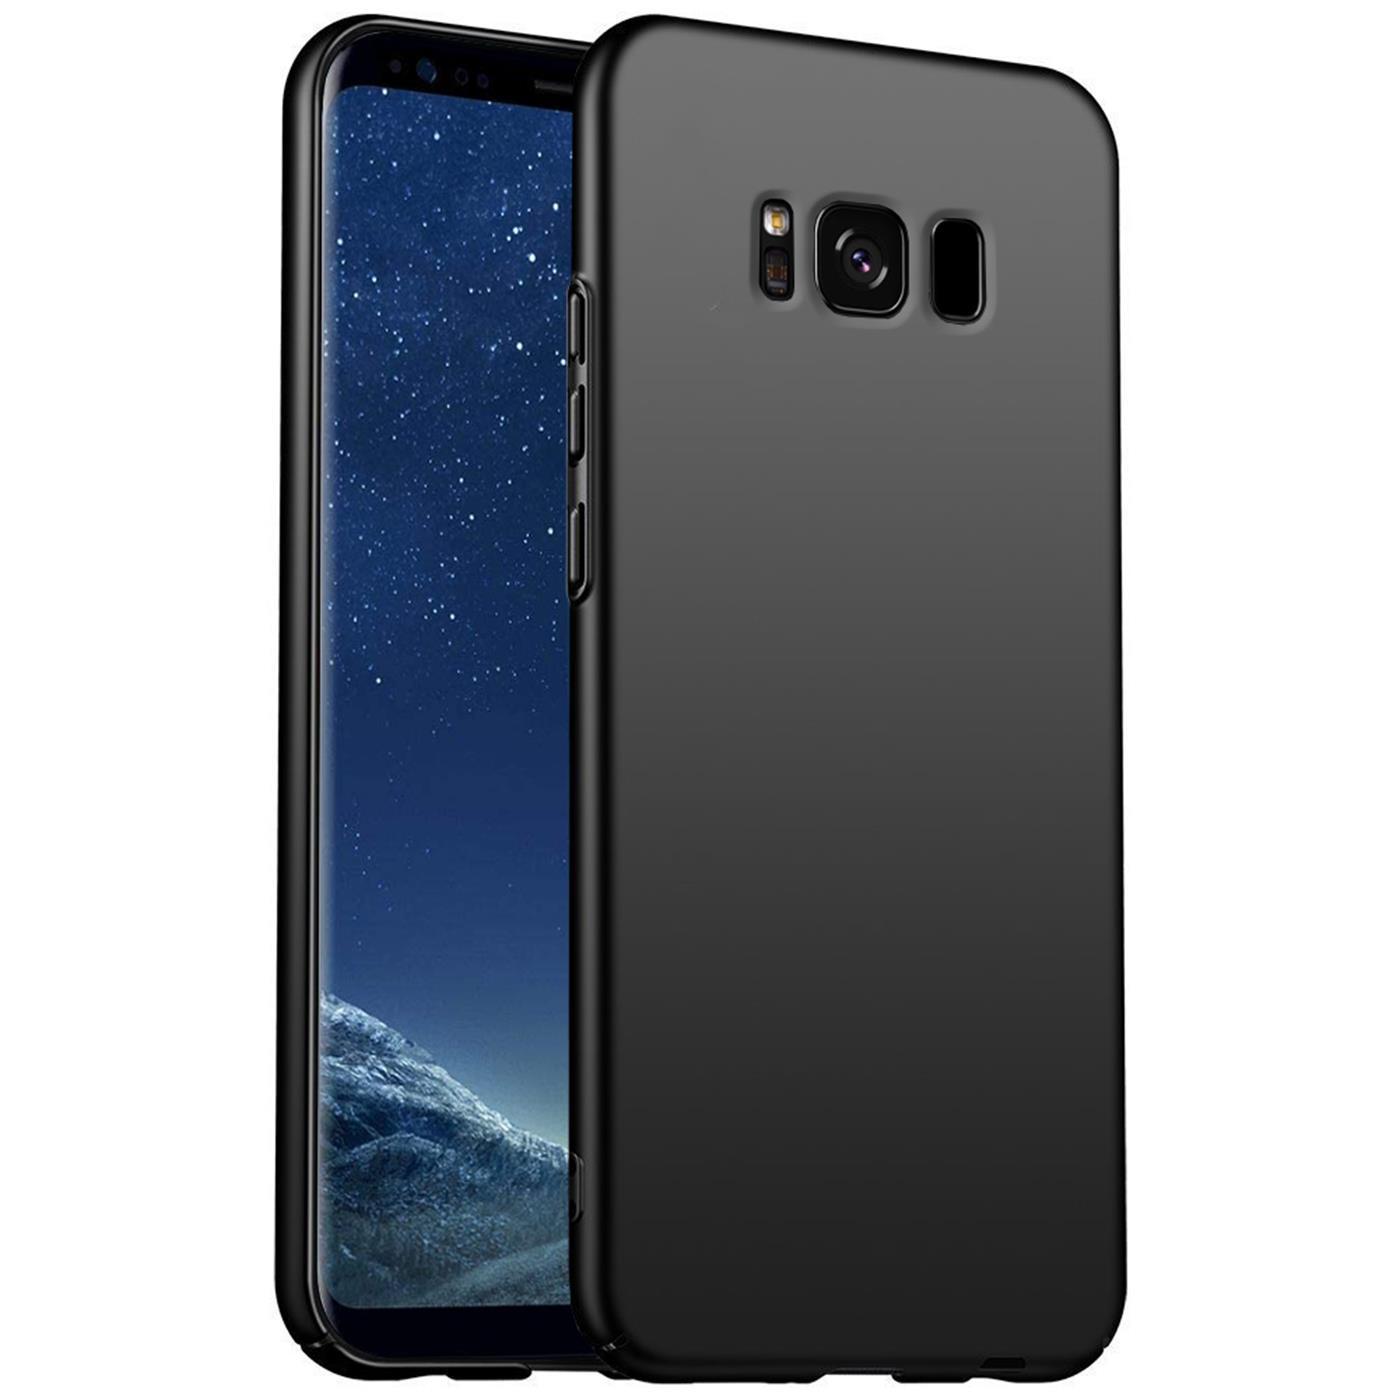 Hard-Back-Case-Cover-Samsung-Galaxy-j3-2016-duenn-Cover-Slim-Shockproof-Rugged Indexbild 6